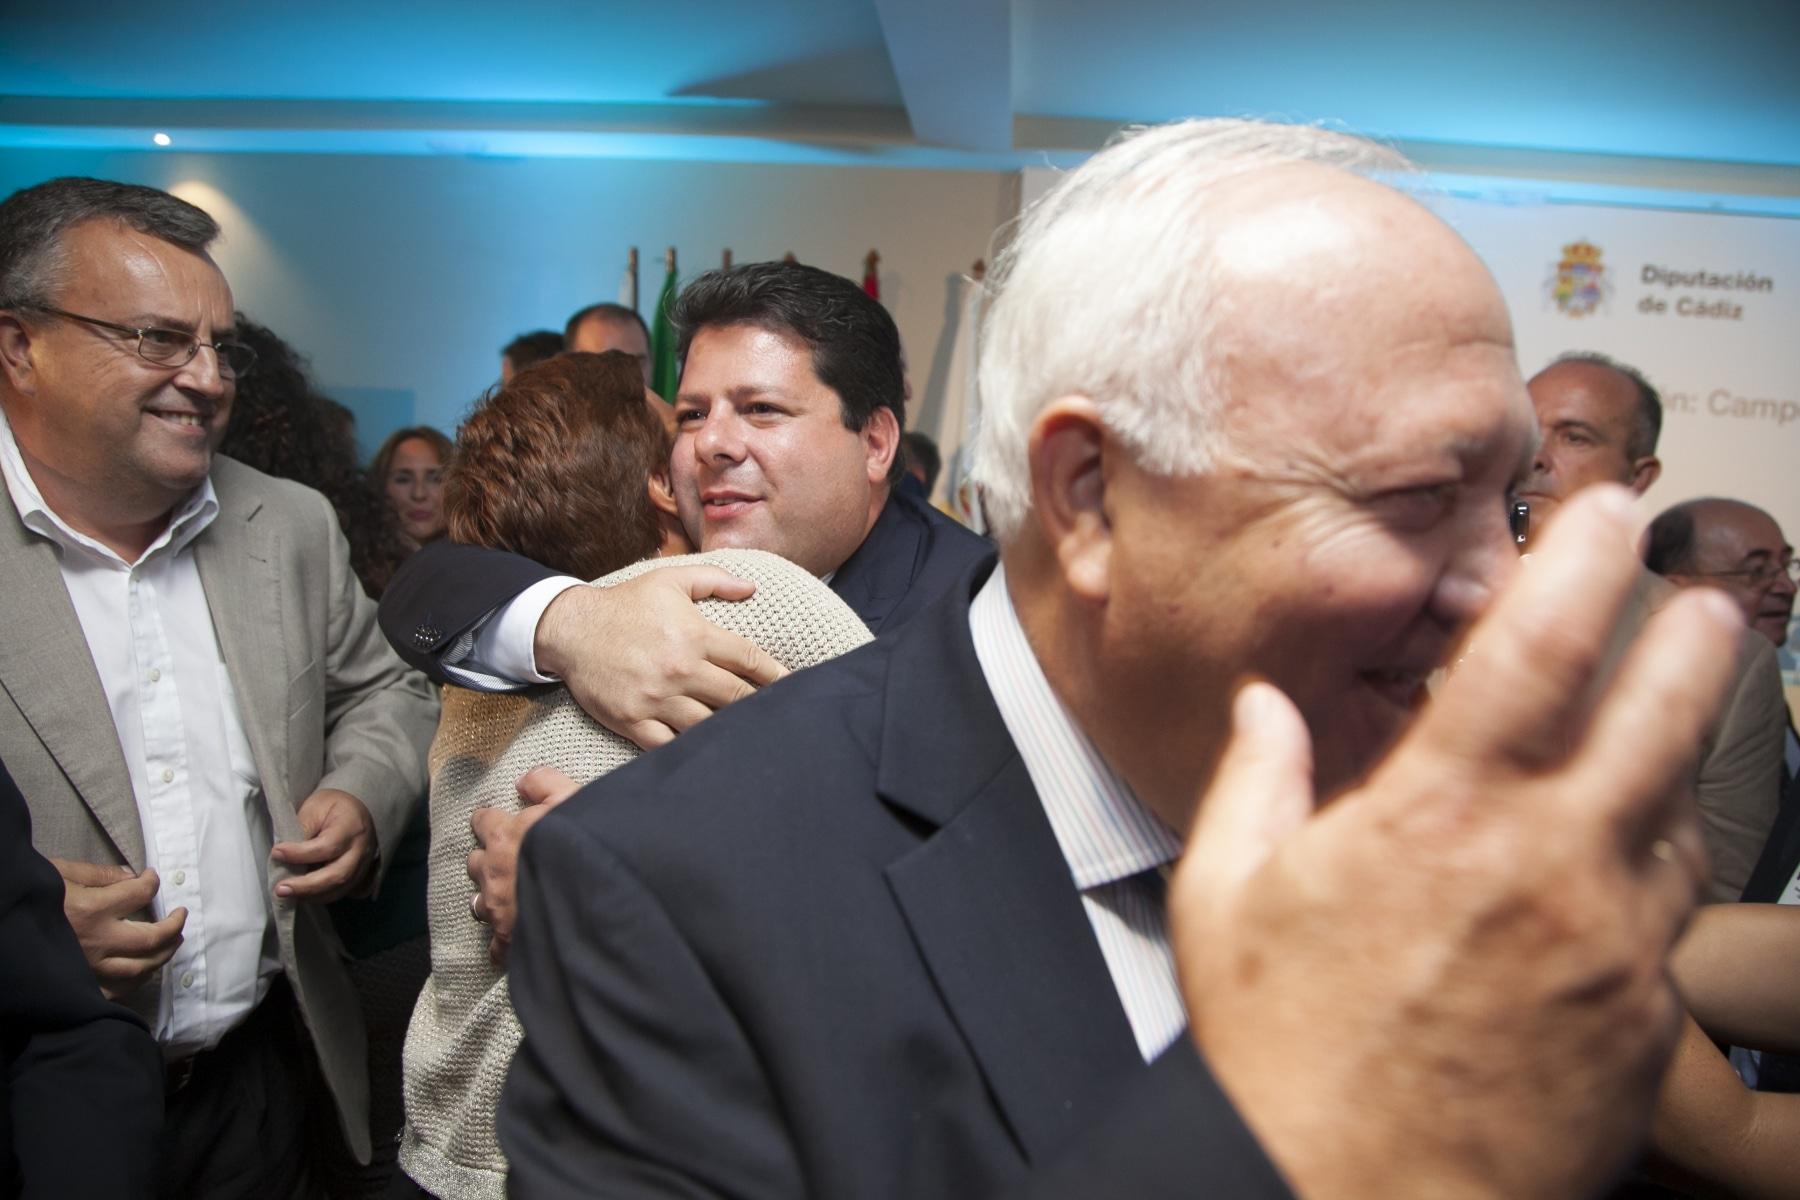 a-exalcaldesa-de-la-lnea-de-la-concepcin-gemma-araujo-psoe-saluda-al-ministro-principal-de-gibraltar-fabian-picardo_21397315186_o